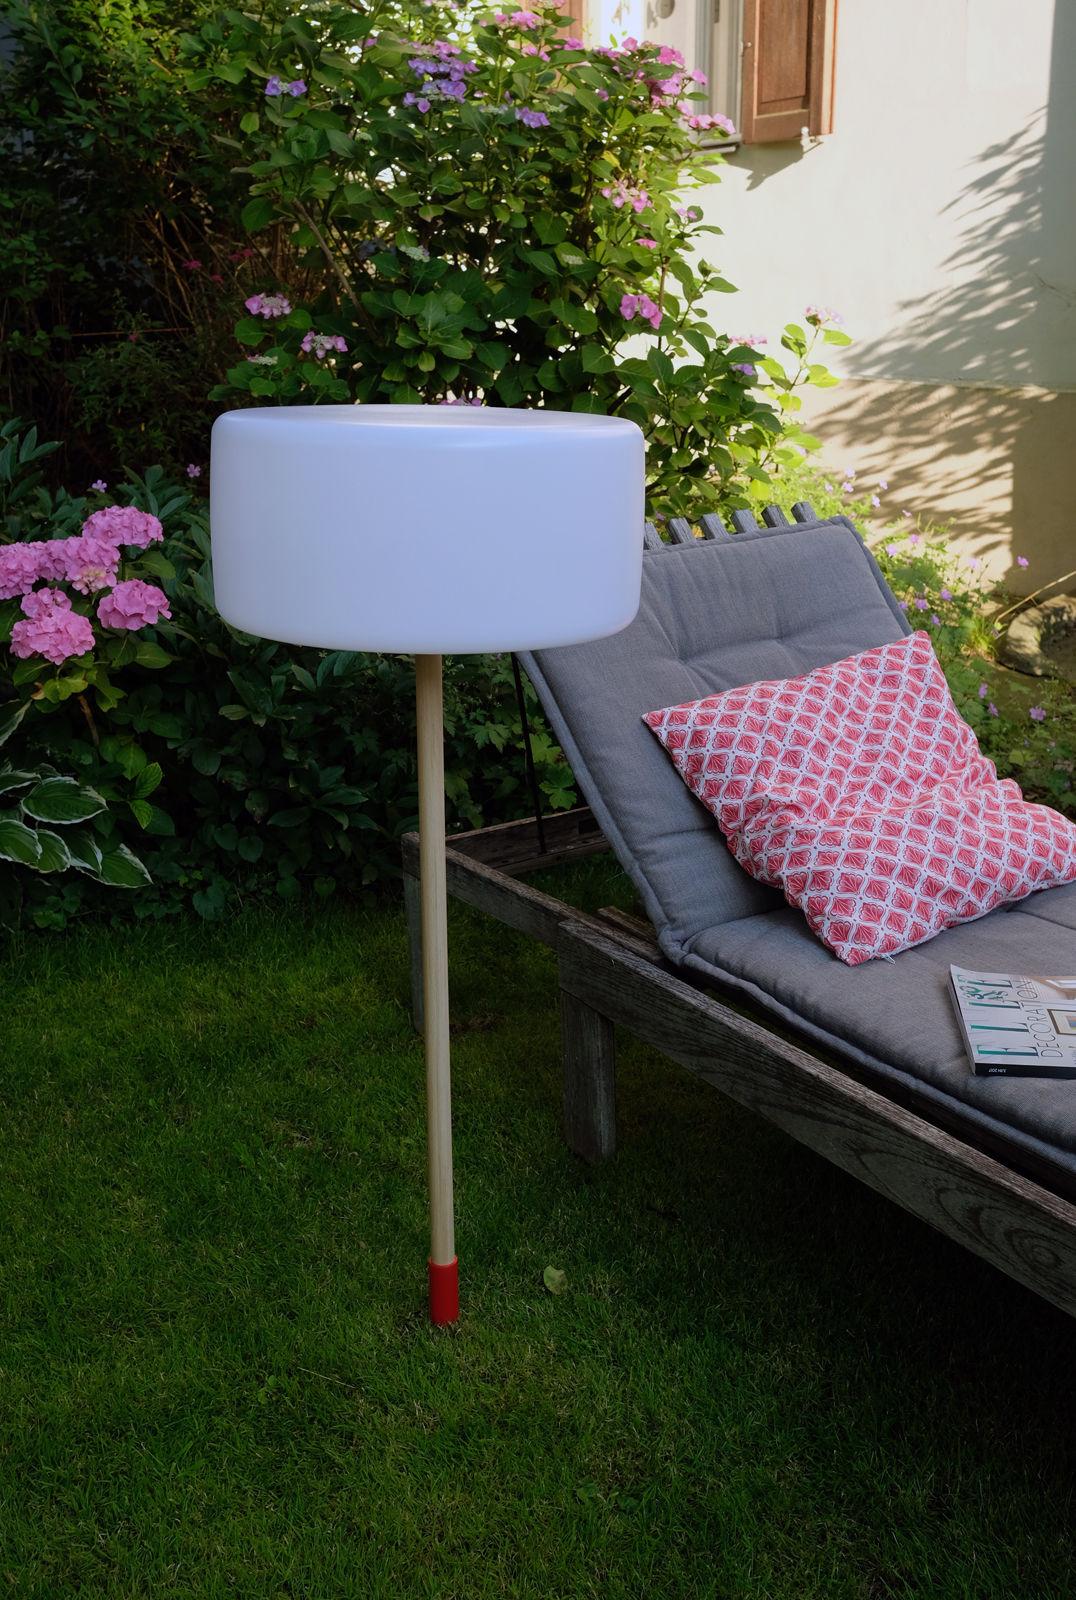 thierry le swinger gem tliches licht f r drau en. Black Bedroom Furniture Sets. Home Design Ideas